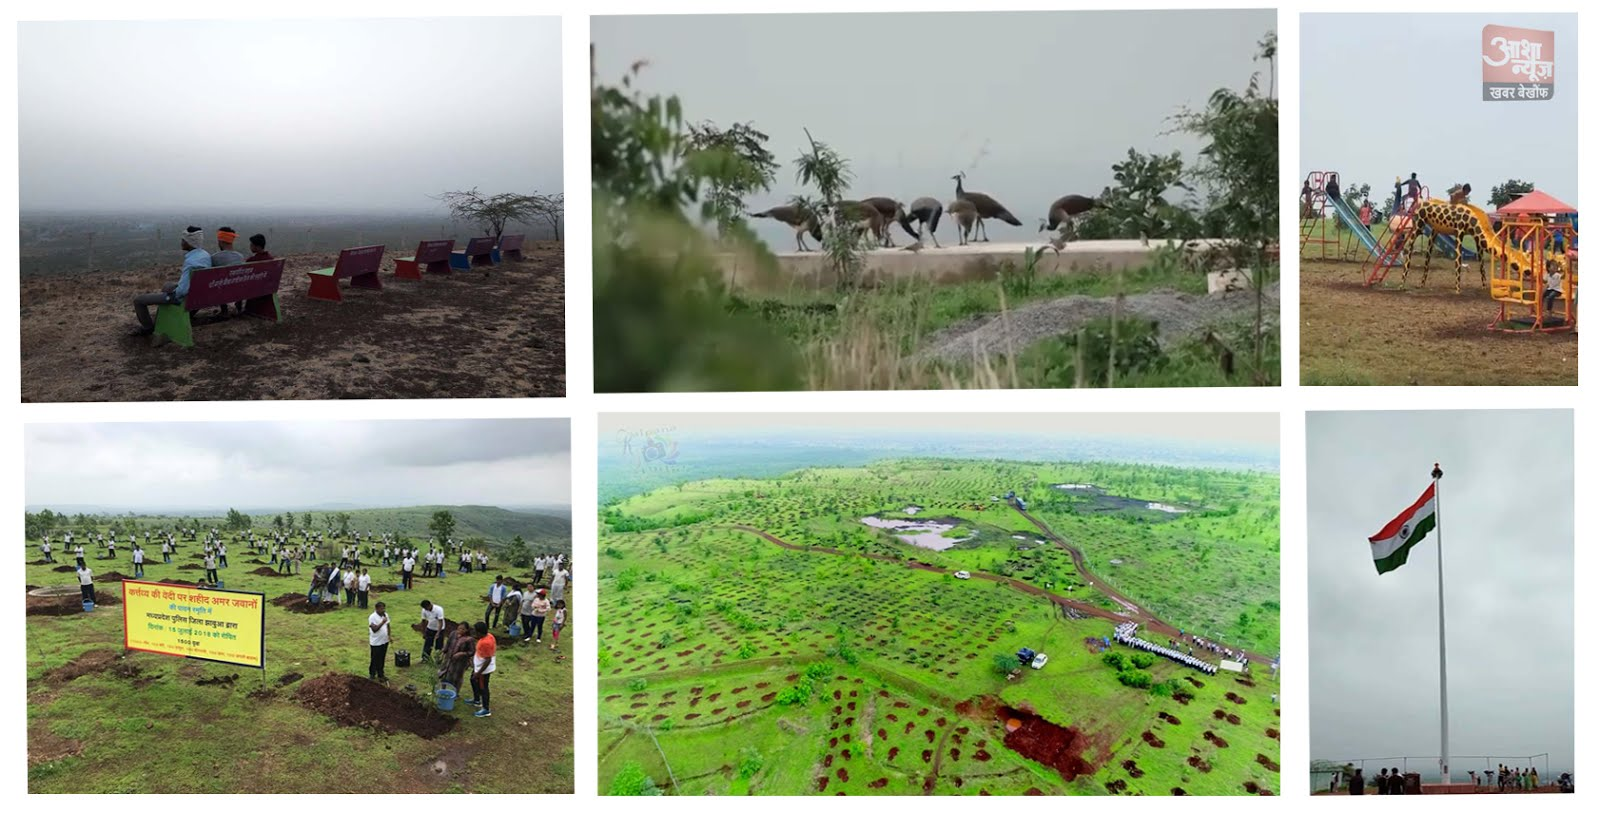 हाथीपावा झाबुआ -haathipawa-jhabua-shivganga-halma-शिवगंगा-हलमा-100-feet-tiranga-in-jhabua-haathi pawa